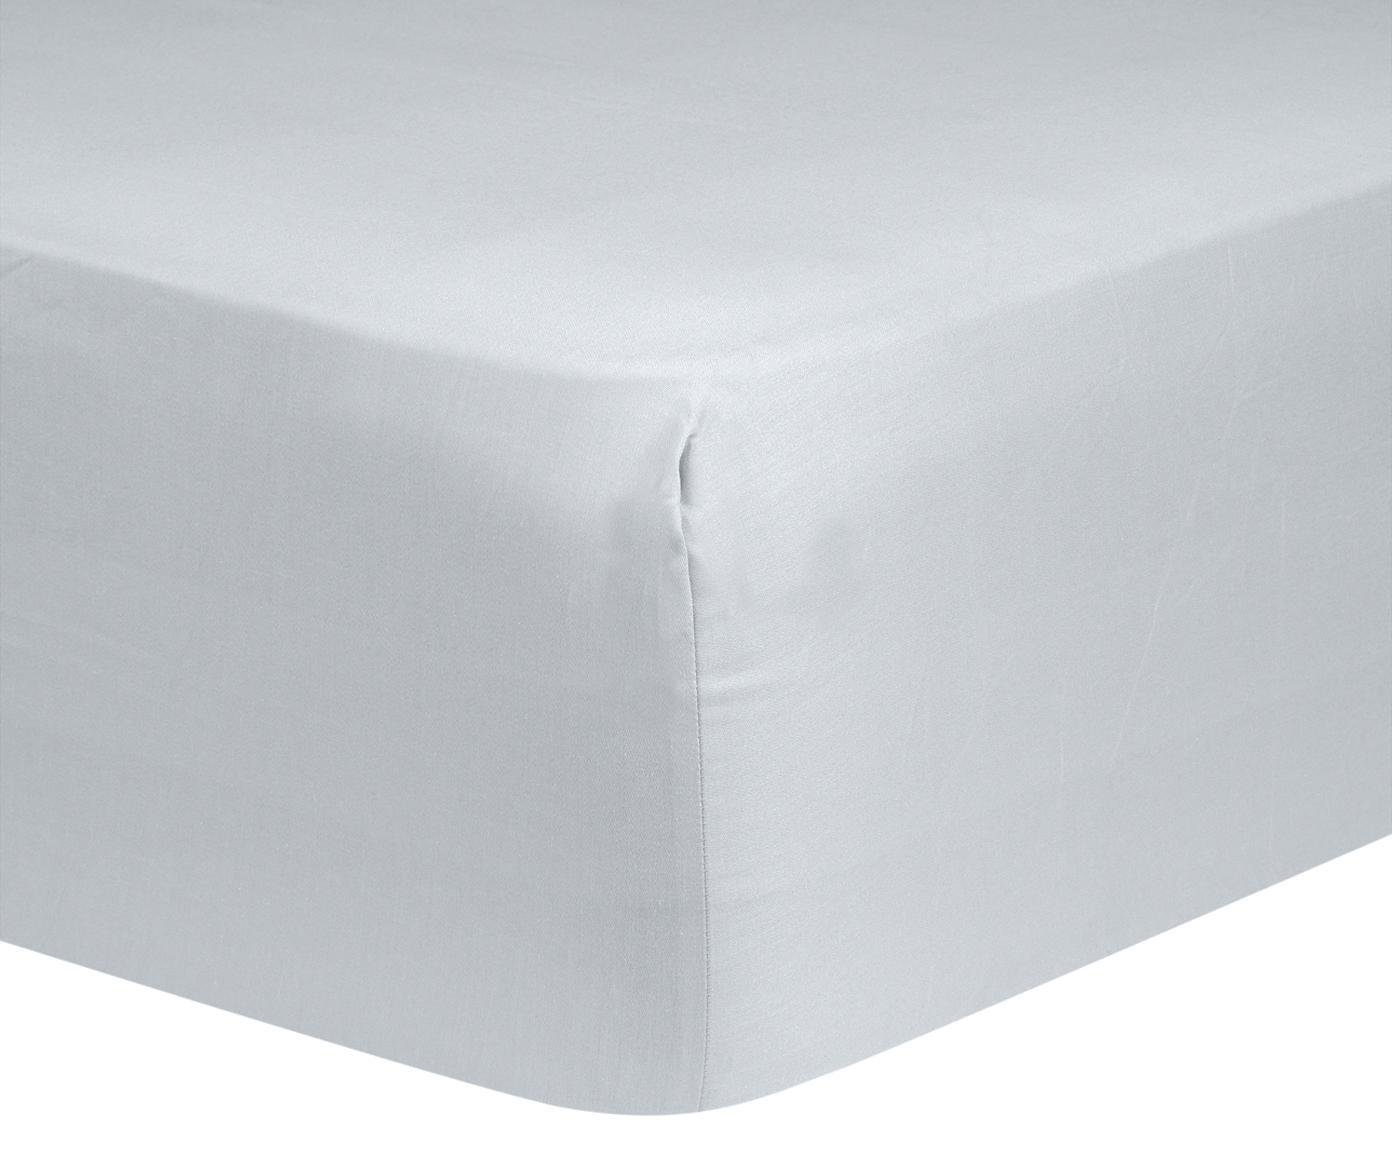 Sábana bajera para boxspring de algodón Comfort, Gris claro, Cama 90 cm (90 x 200 cm)